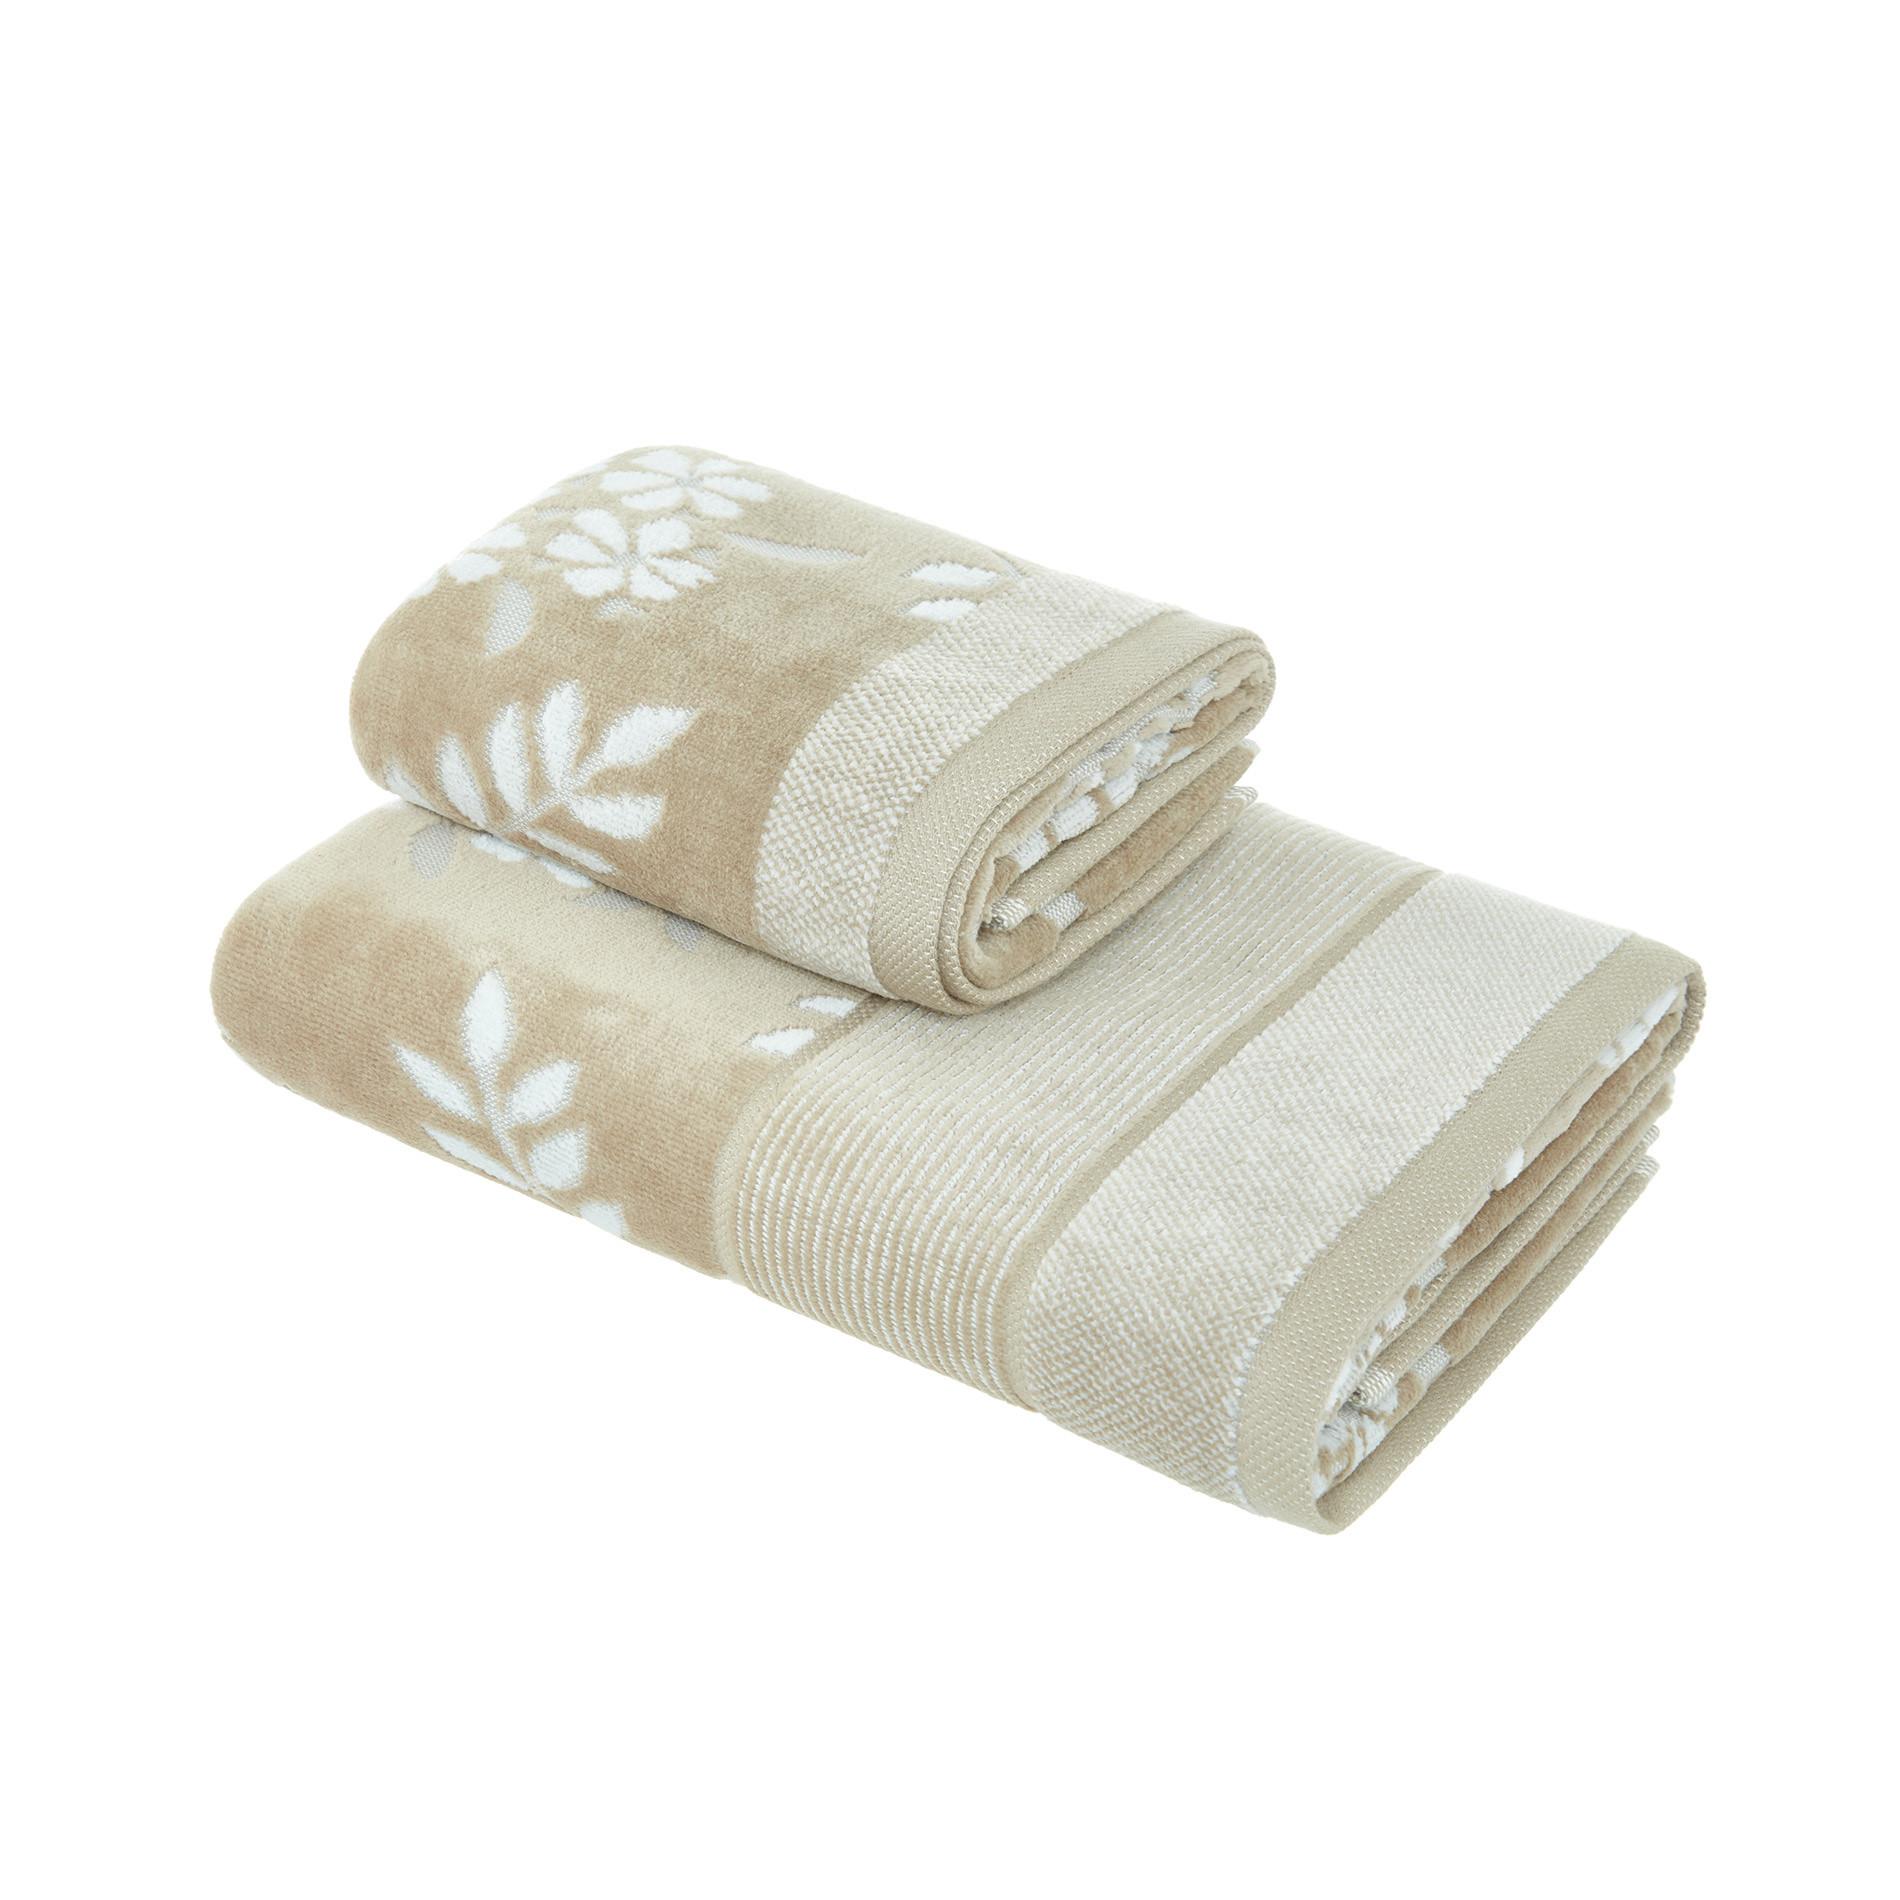 Asciugamano cotone velour motivo floreale Portofino, Beige, large image number 0